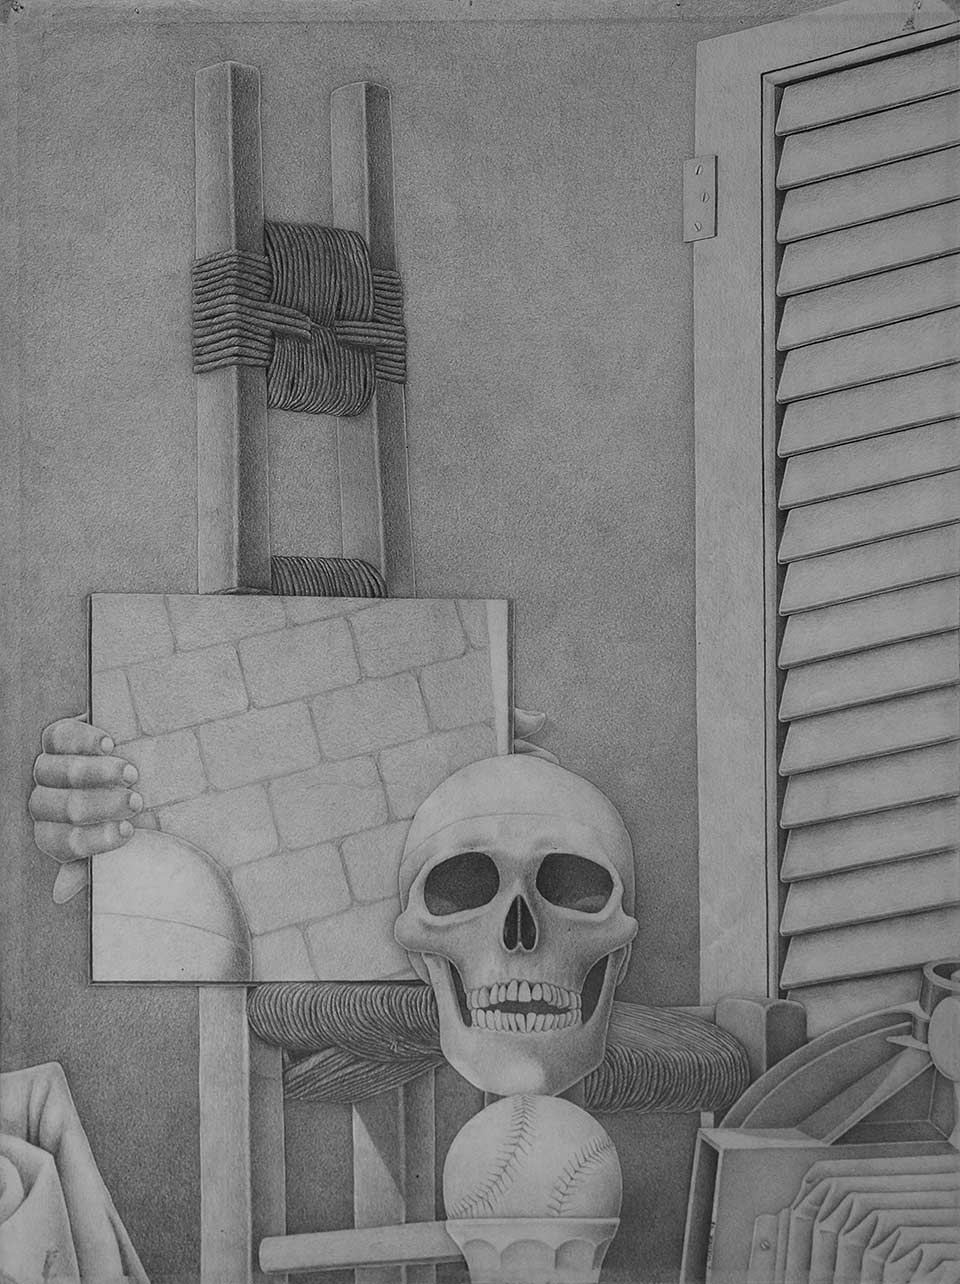 Full_StillLife_Skull-on-Chair